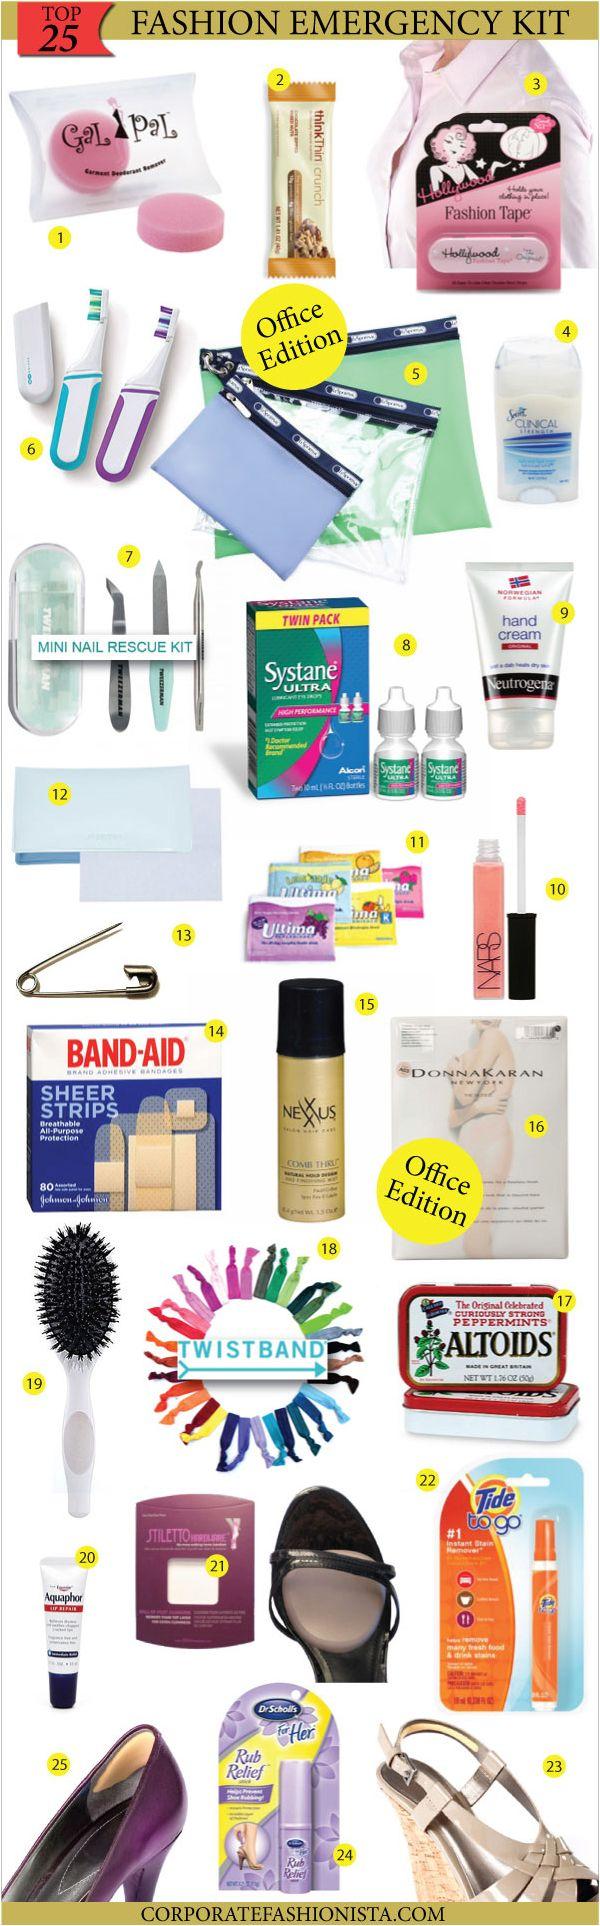 Office Fashion Emergency Kit | http://www.corporatefashionista.com/